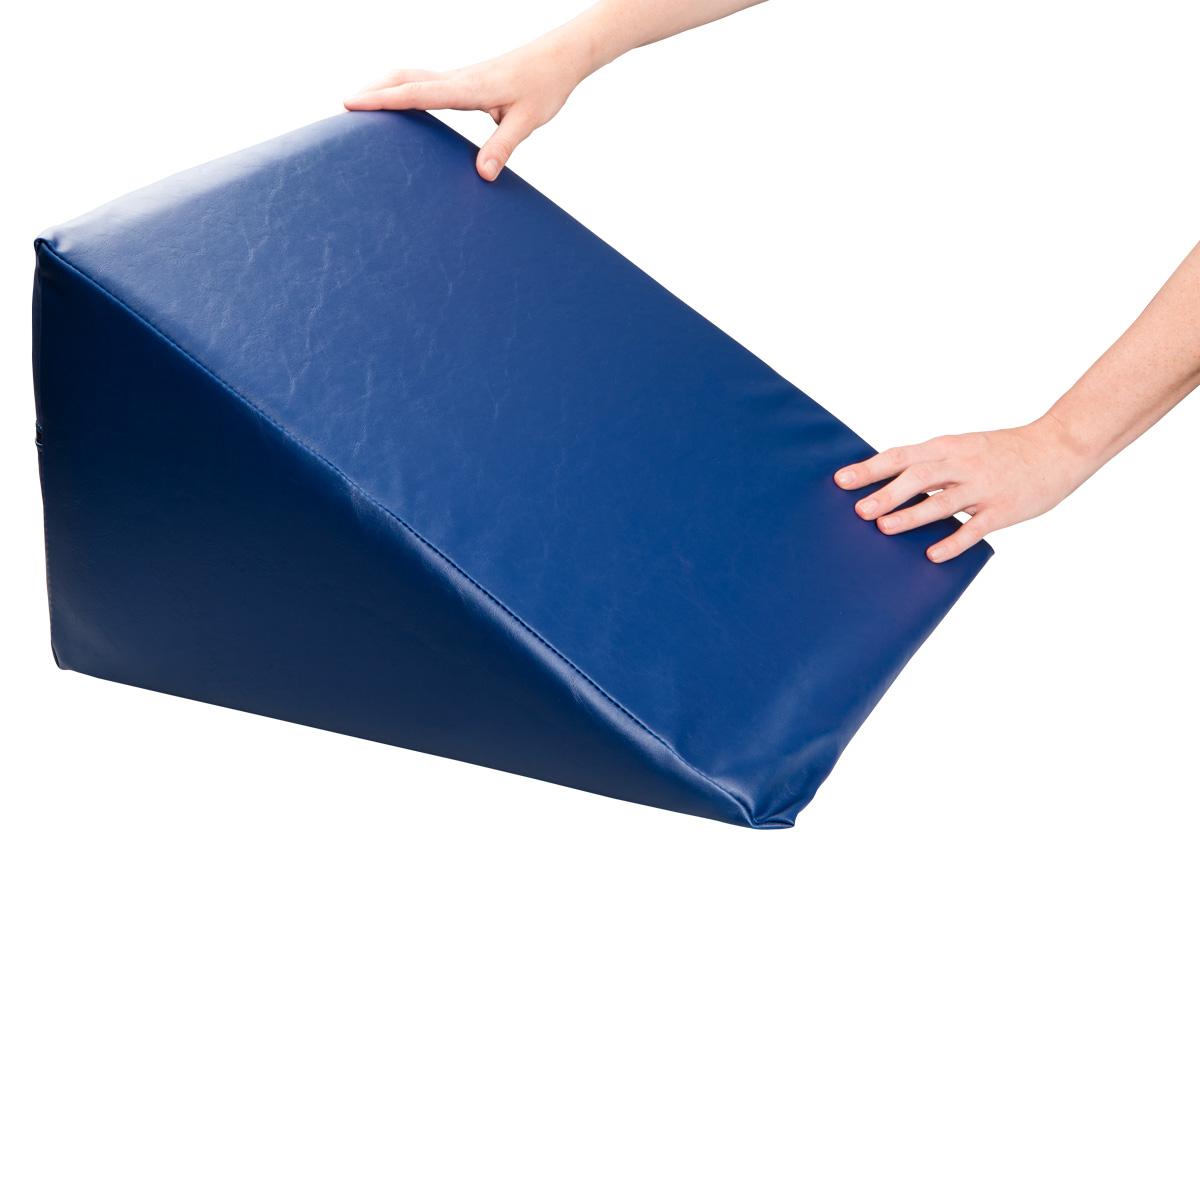 Large Foam Wedge Pillow  1004999  3B Scientific